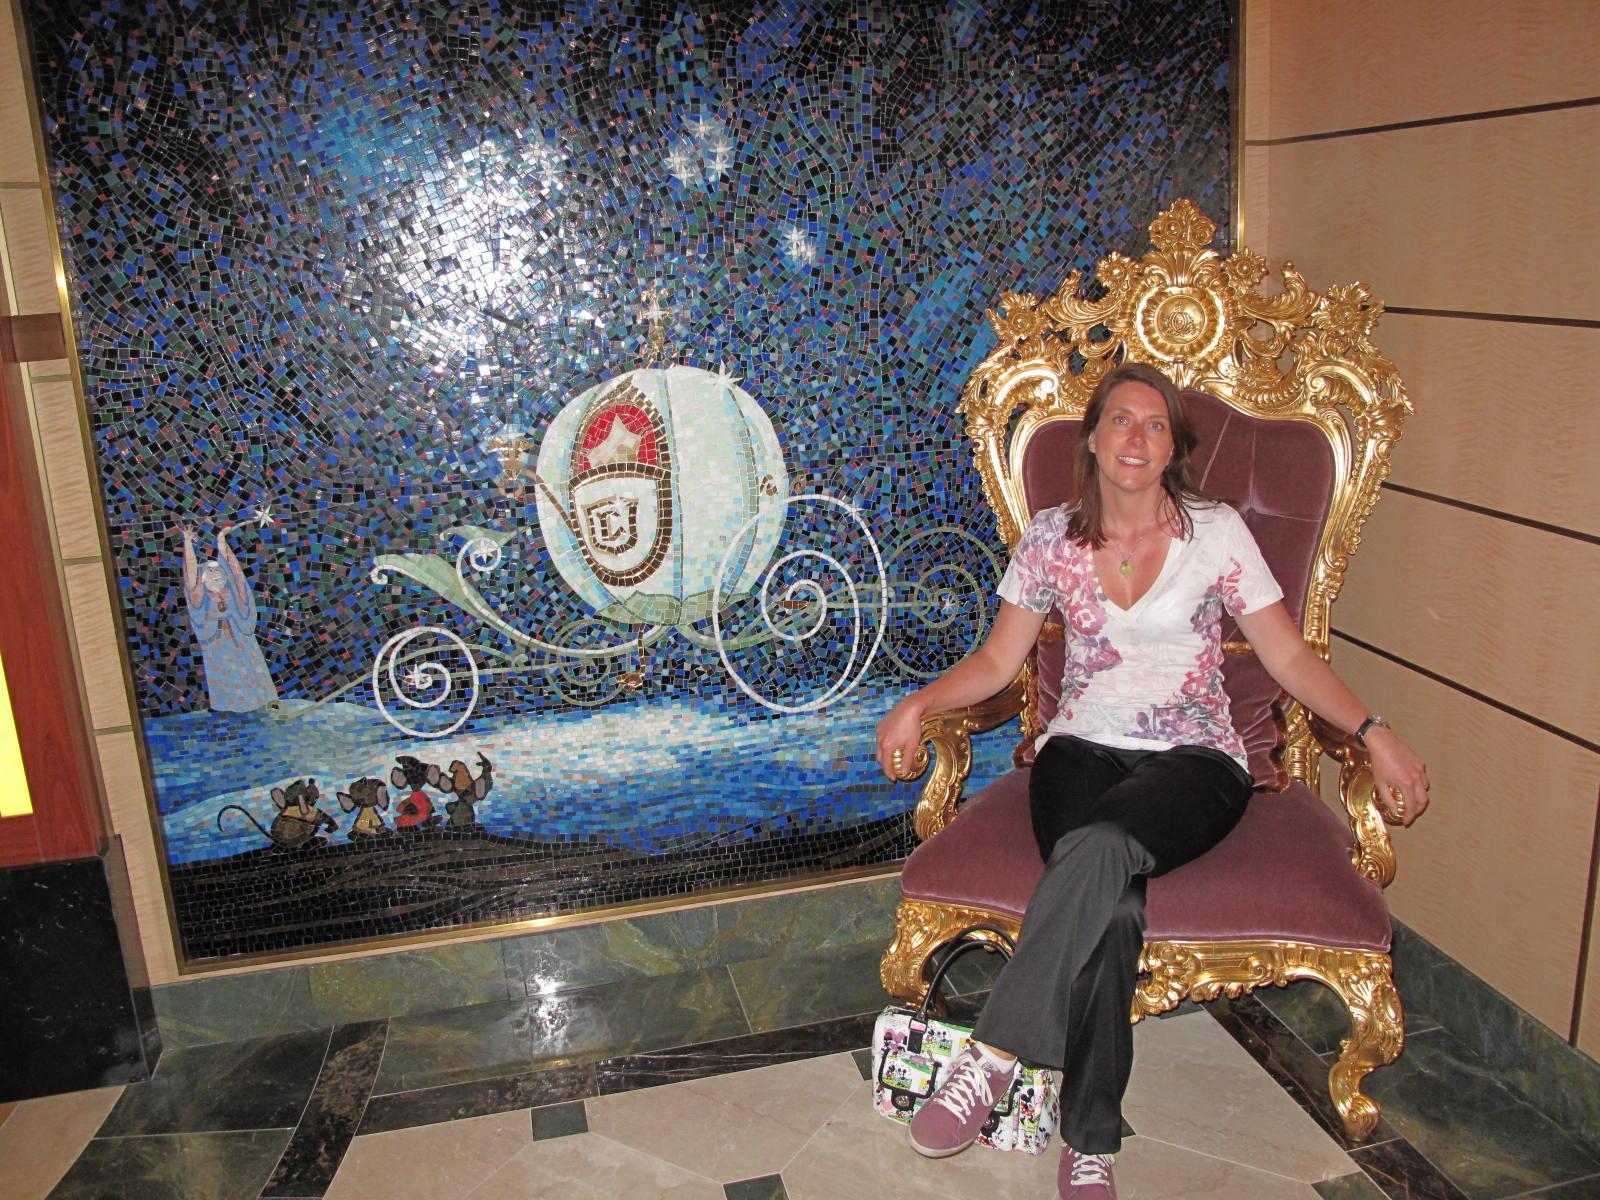 Resesidan.se gästbloggare Maria